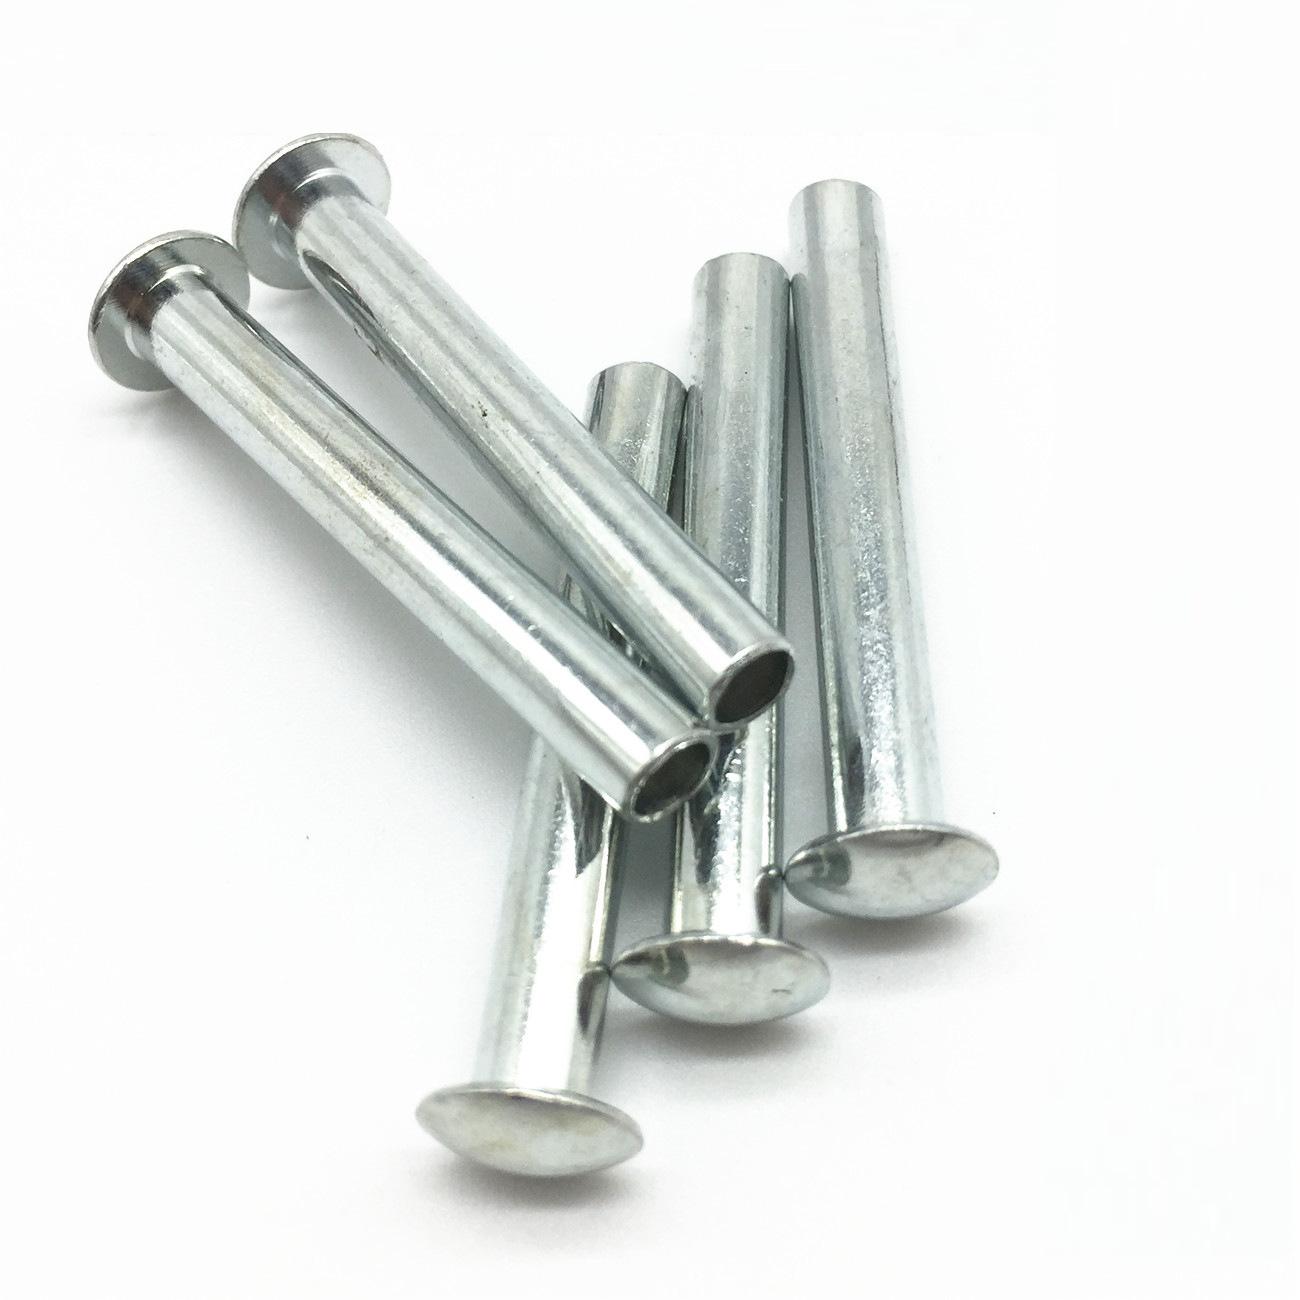 DENGBO Semi-hollow flat round head iron rivets Metal single-sided industrial white galvanized rivets